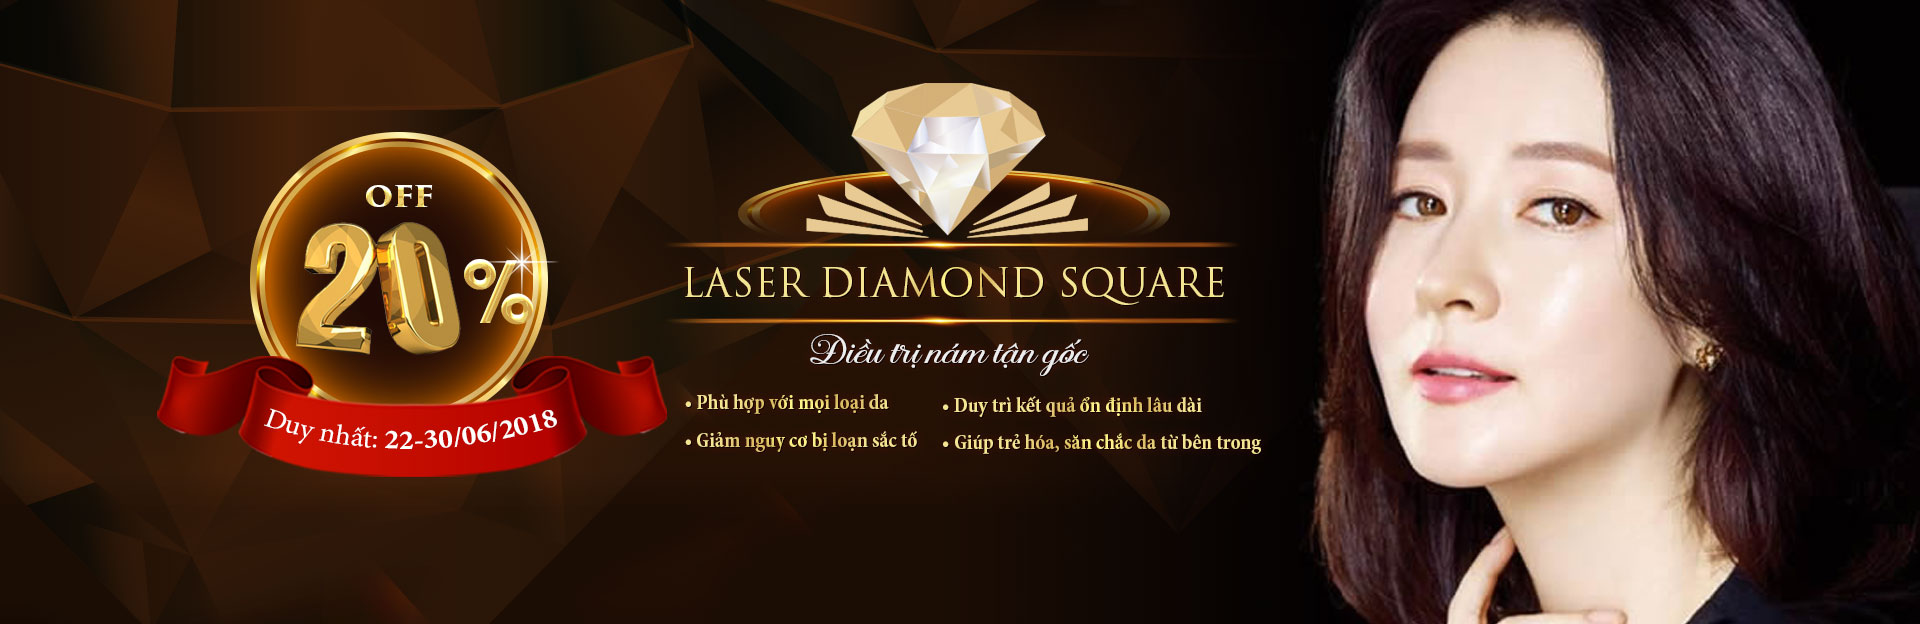 Banner Laser Diamond